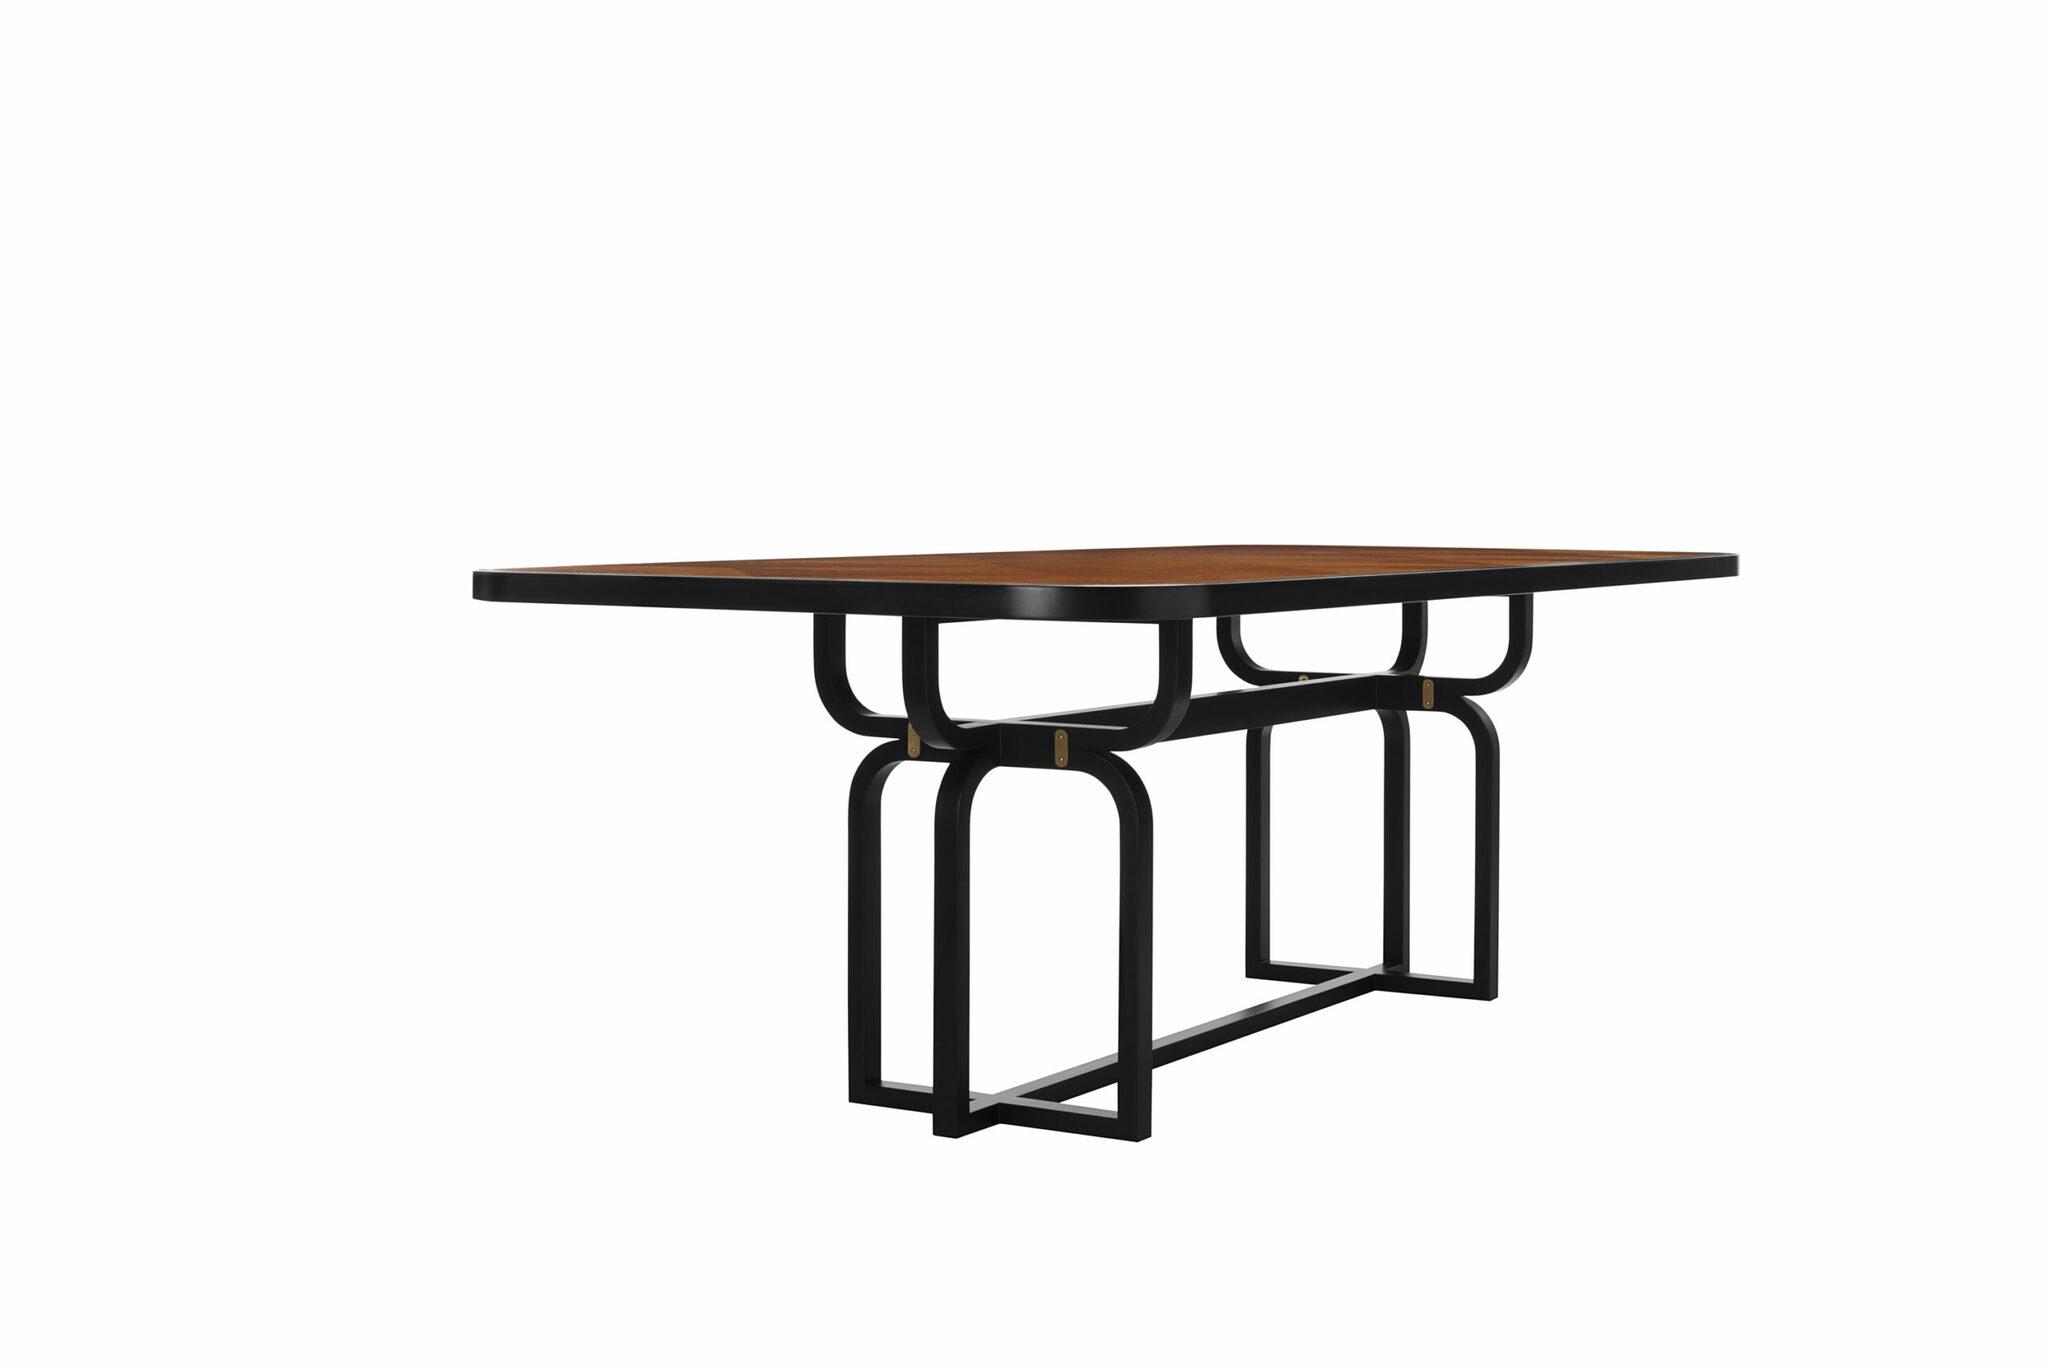 caryllon thonet dining table by cristina celestino